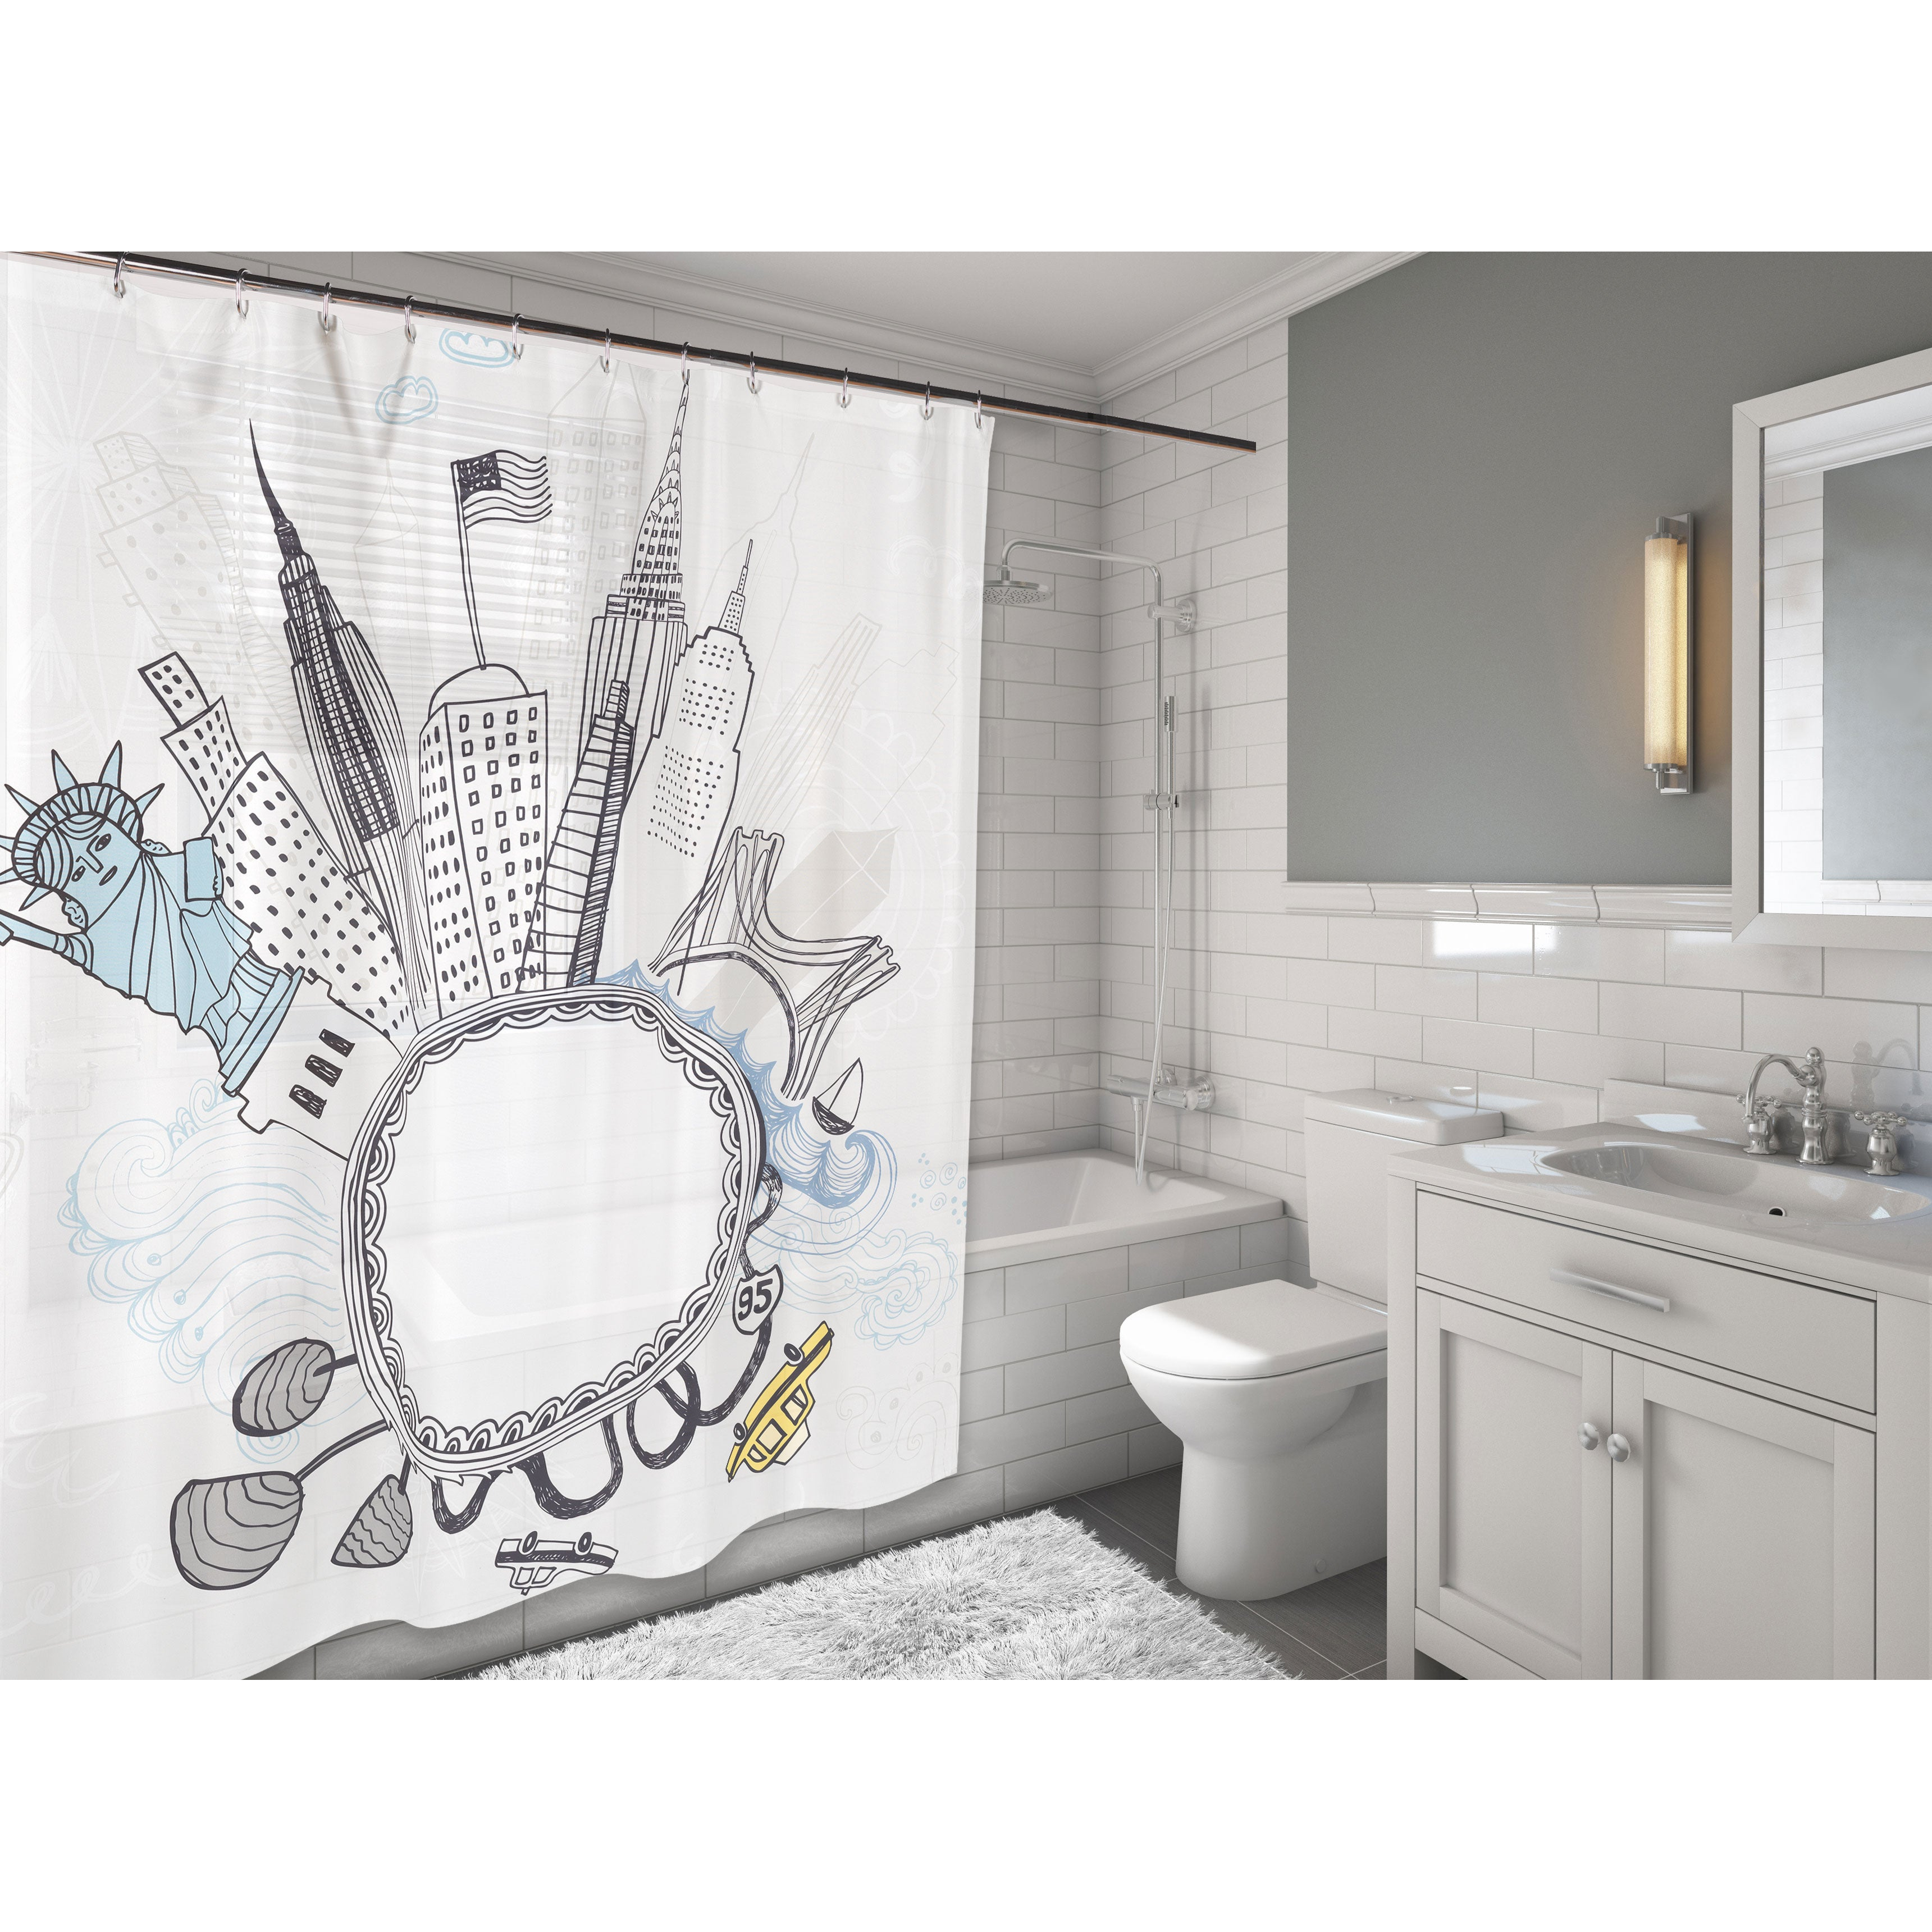 Carnation Home Fashions 'Funky City' Fabric Shower Curtai...